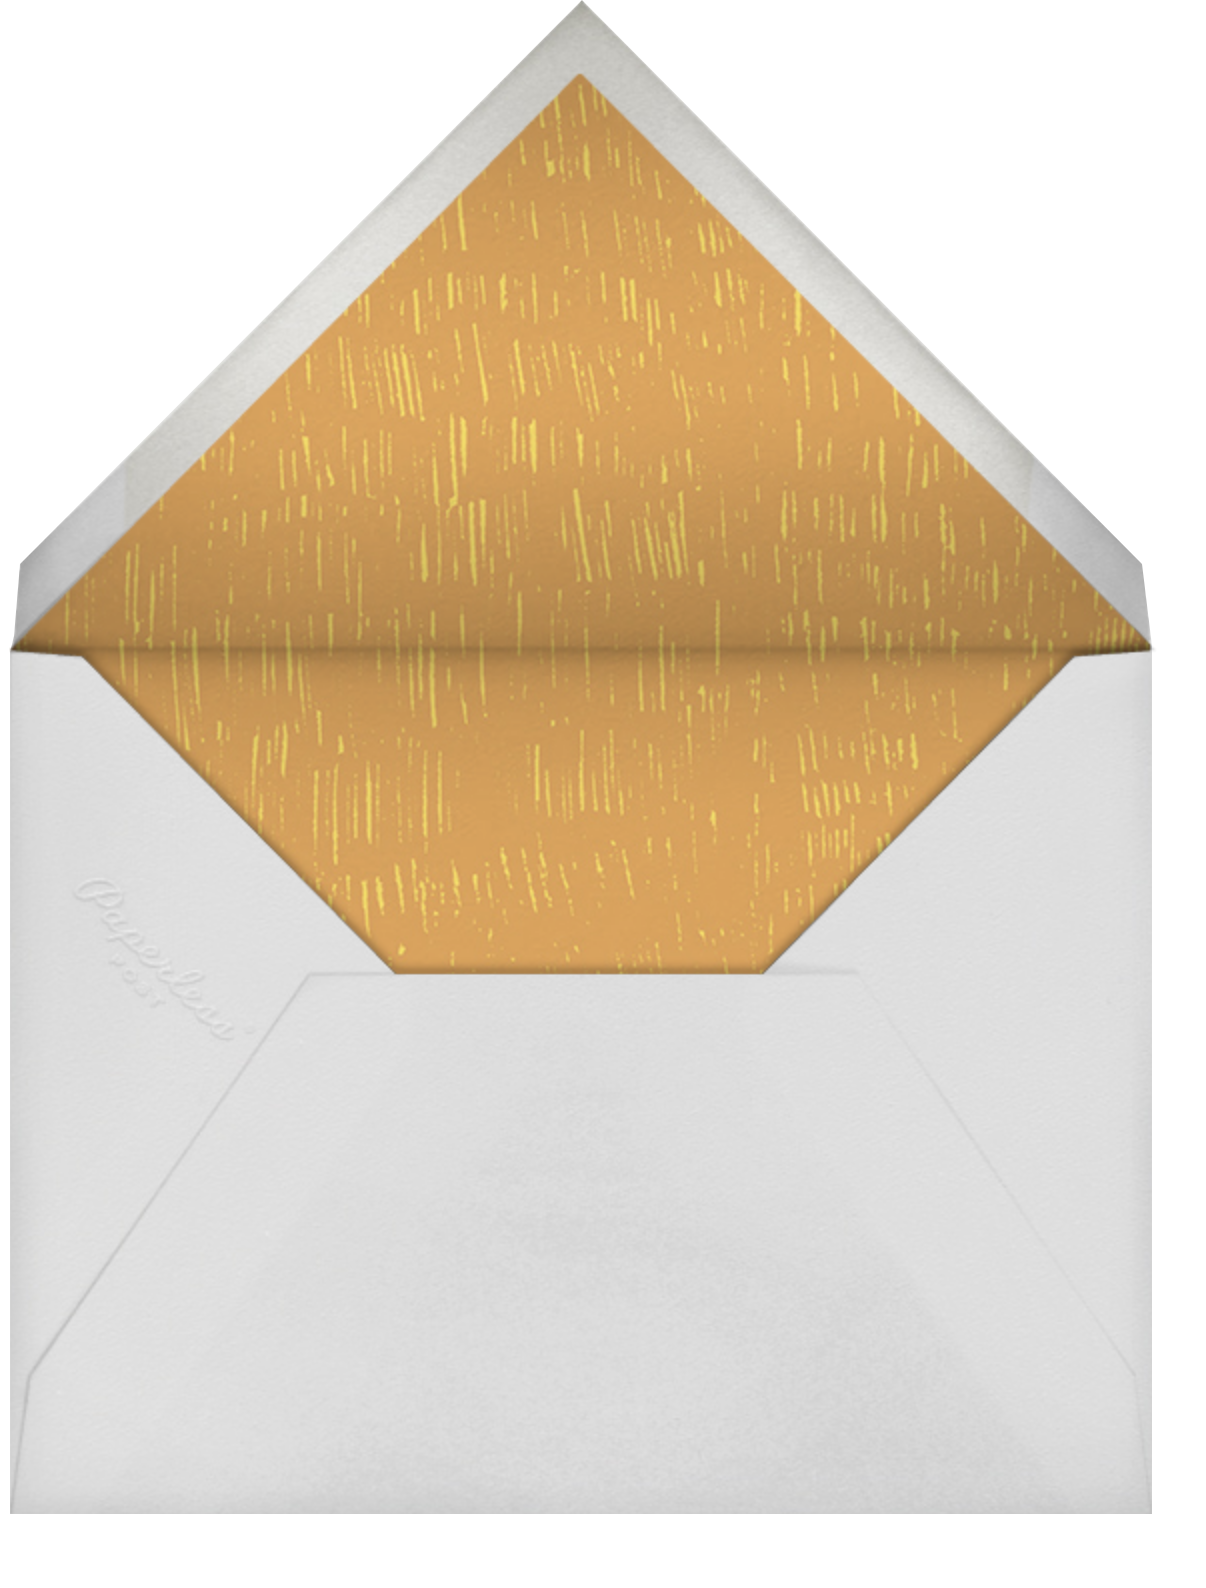 Kumquat Collar - Paperless Post - Holiday cards - envelope back